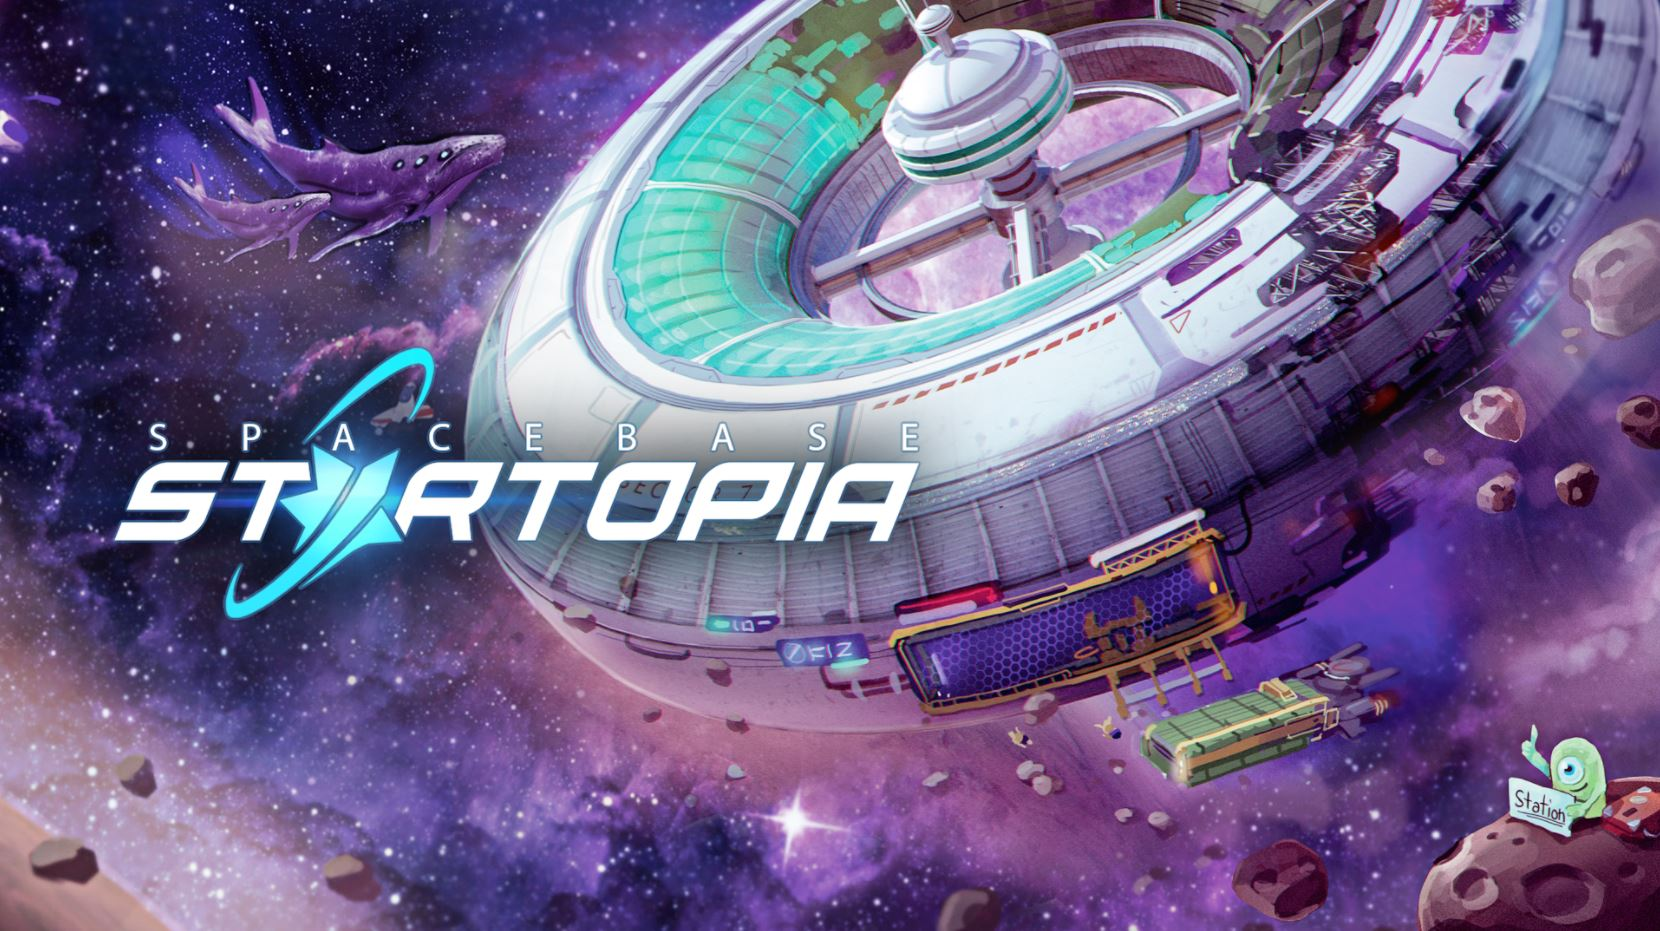 spacebase-startopia-ps4-news-reviews-videos